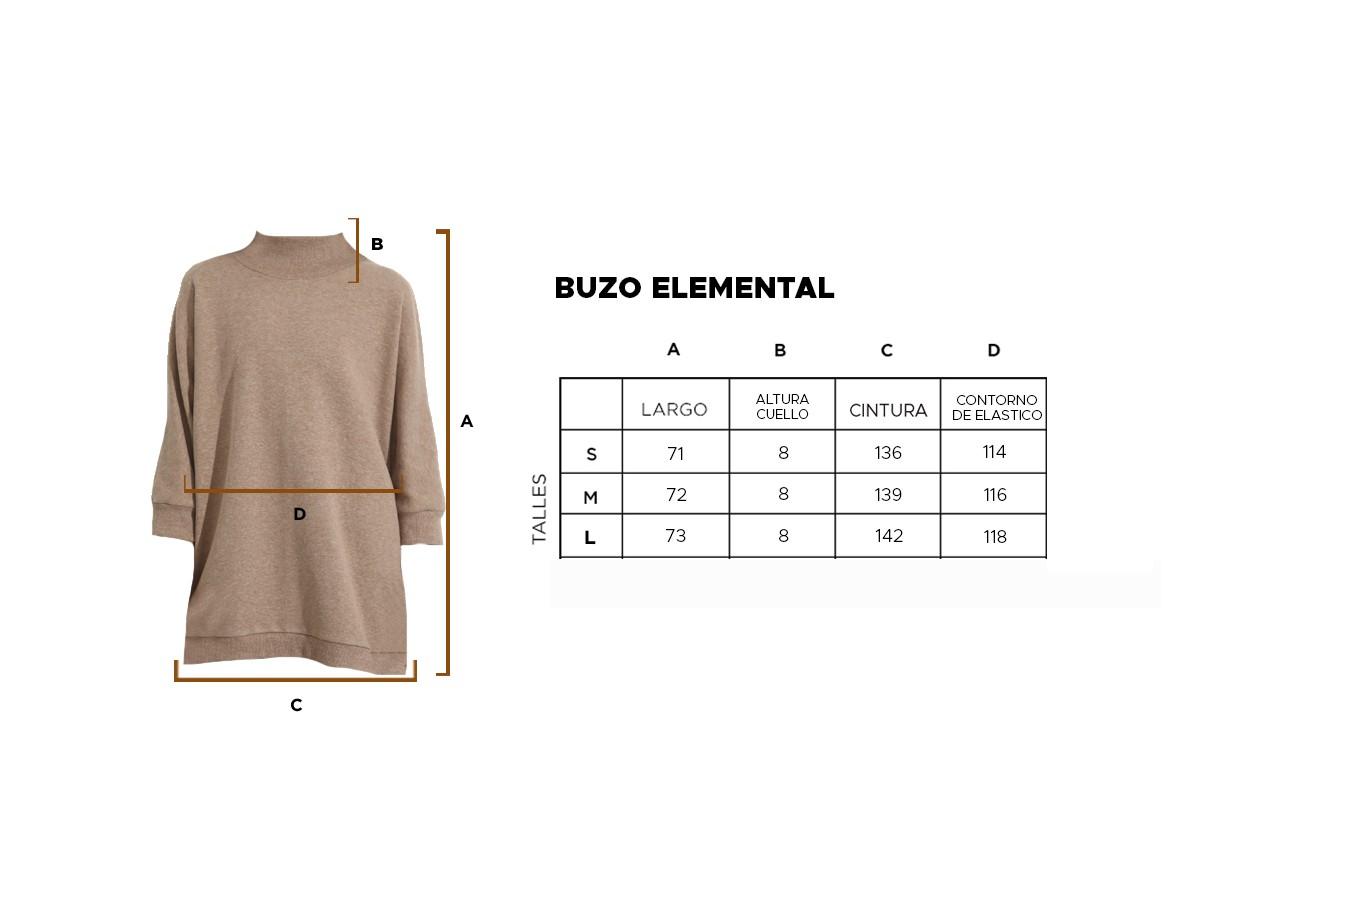 BUZO ELEMENTAL 21